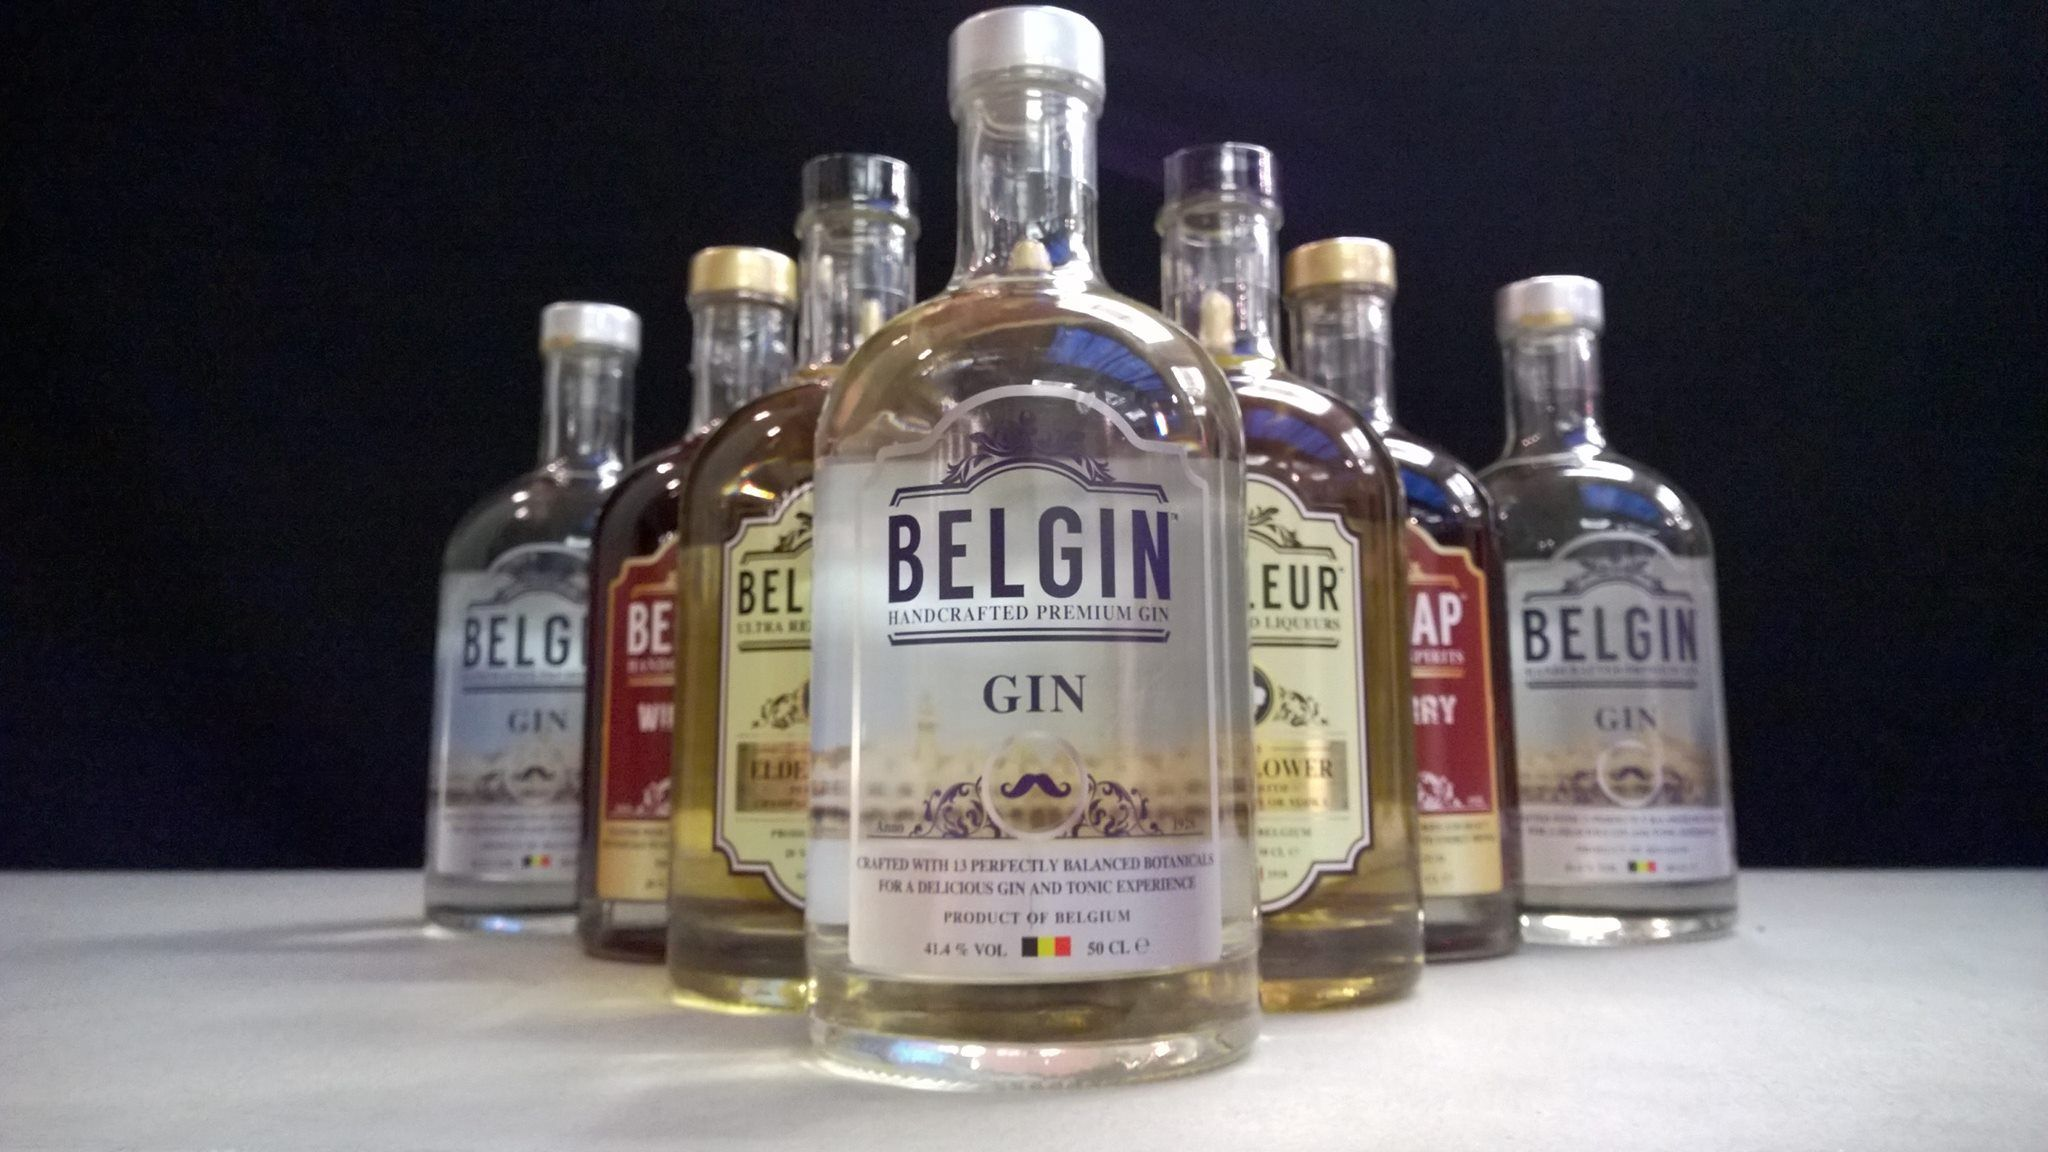 Belgin gin, Belfleur elderflower, belsnap wild berry. Belgian spirits